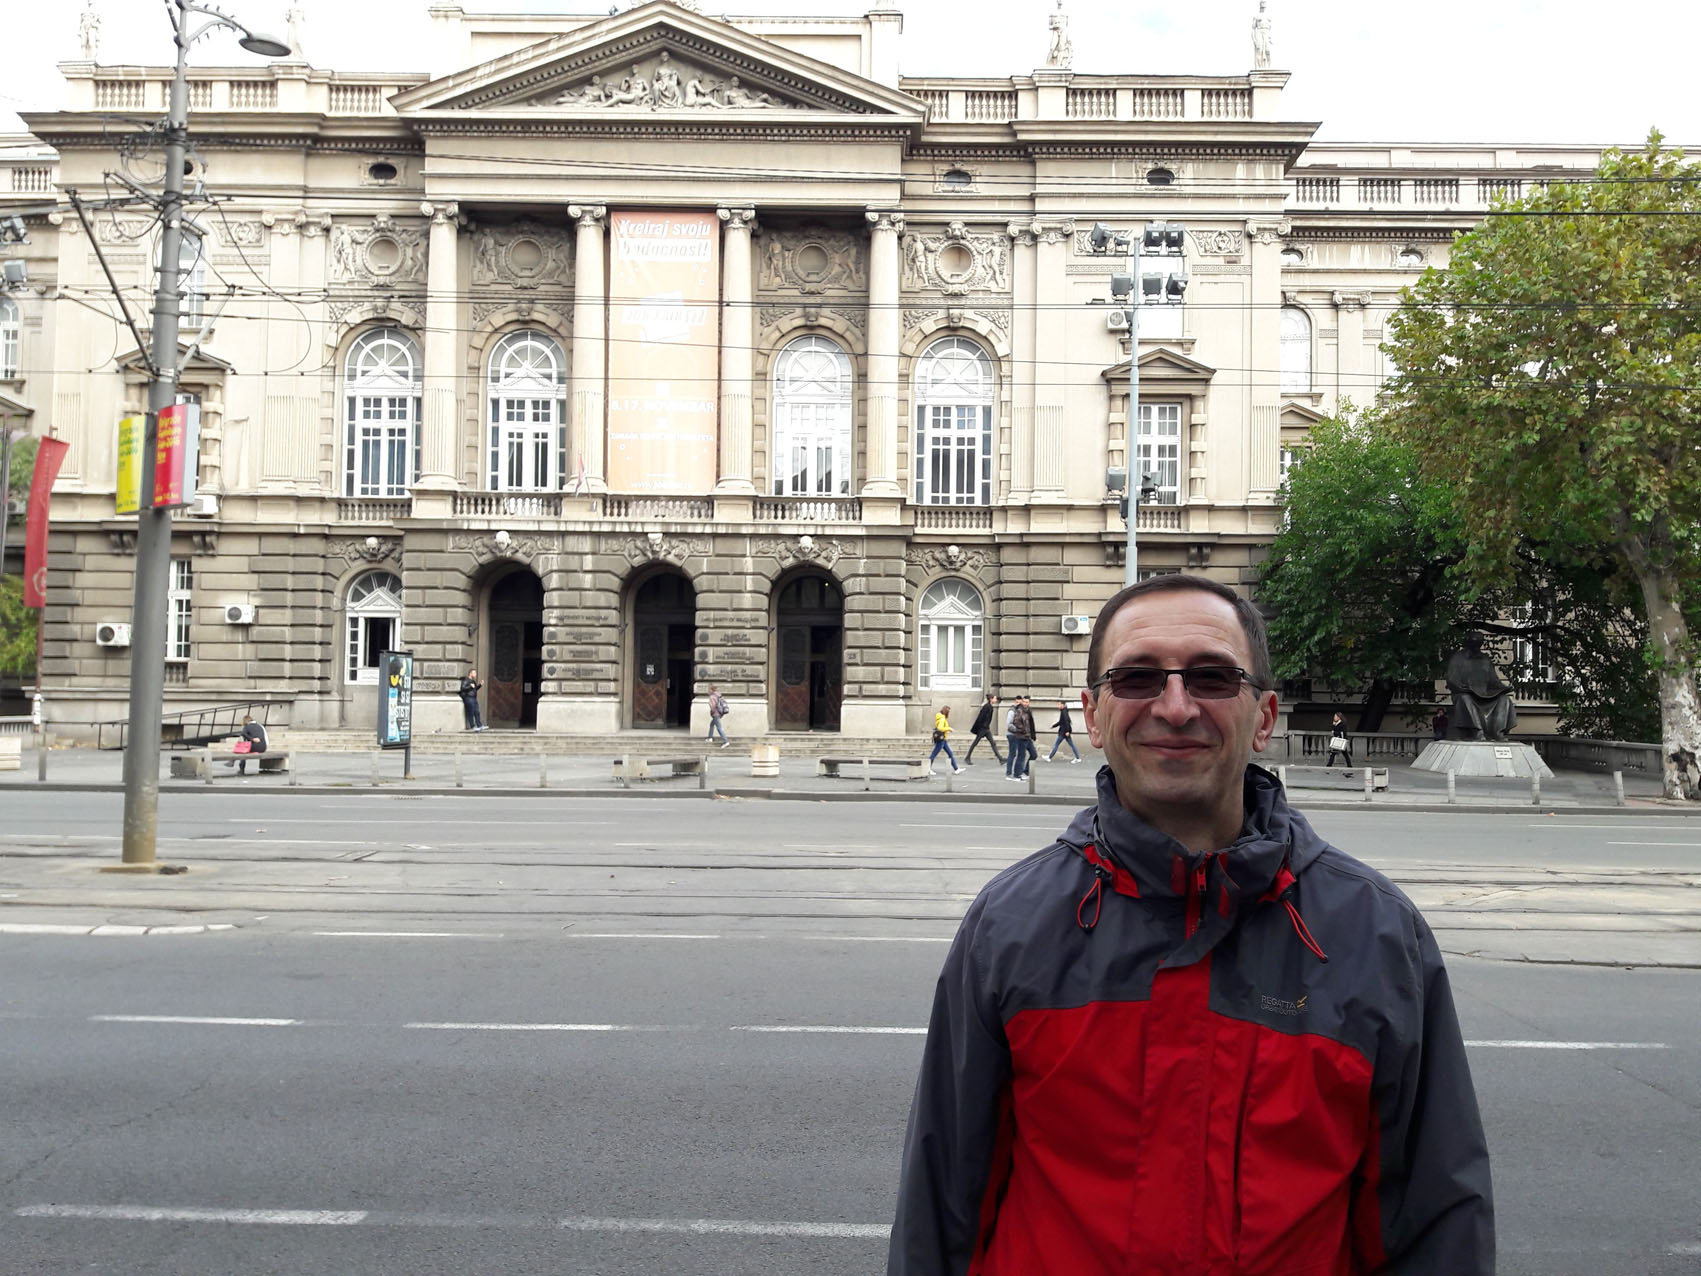 Dragan outside 'Gradjevinski Fakultet' (Faculty of Civil Engineering)